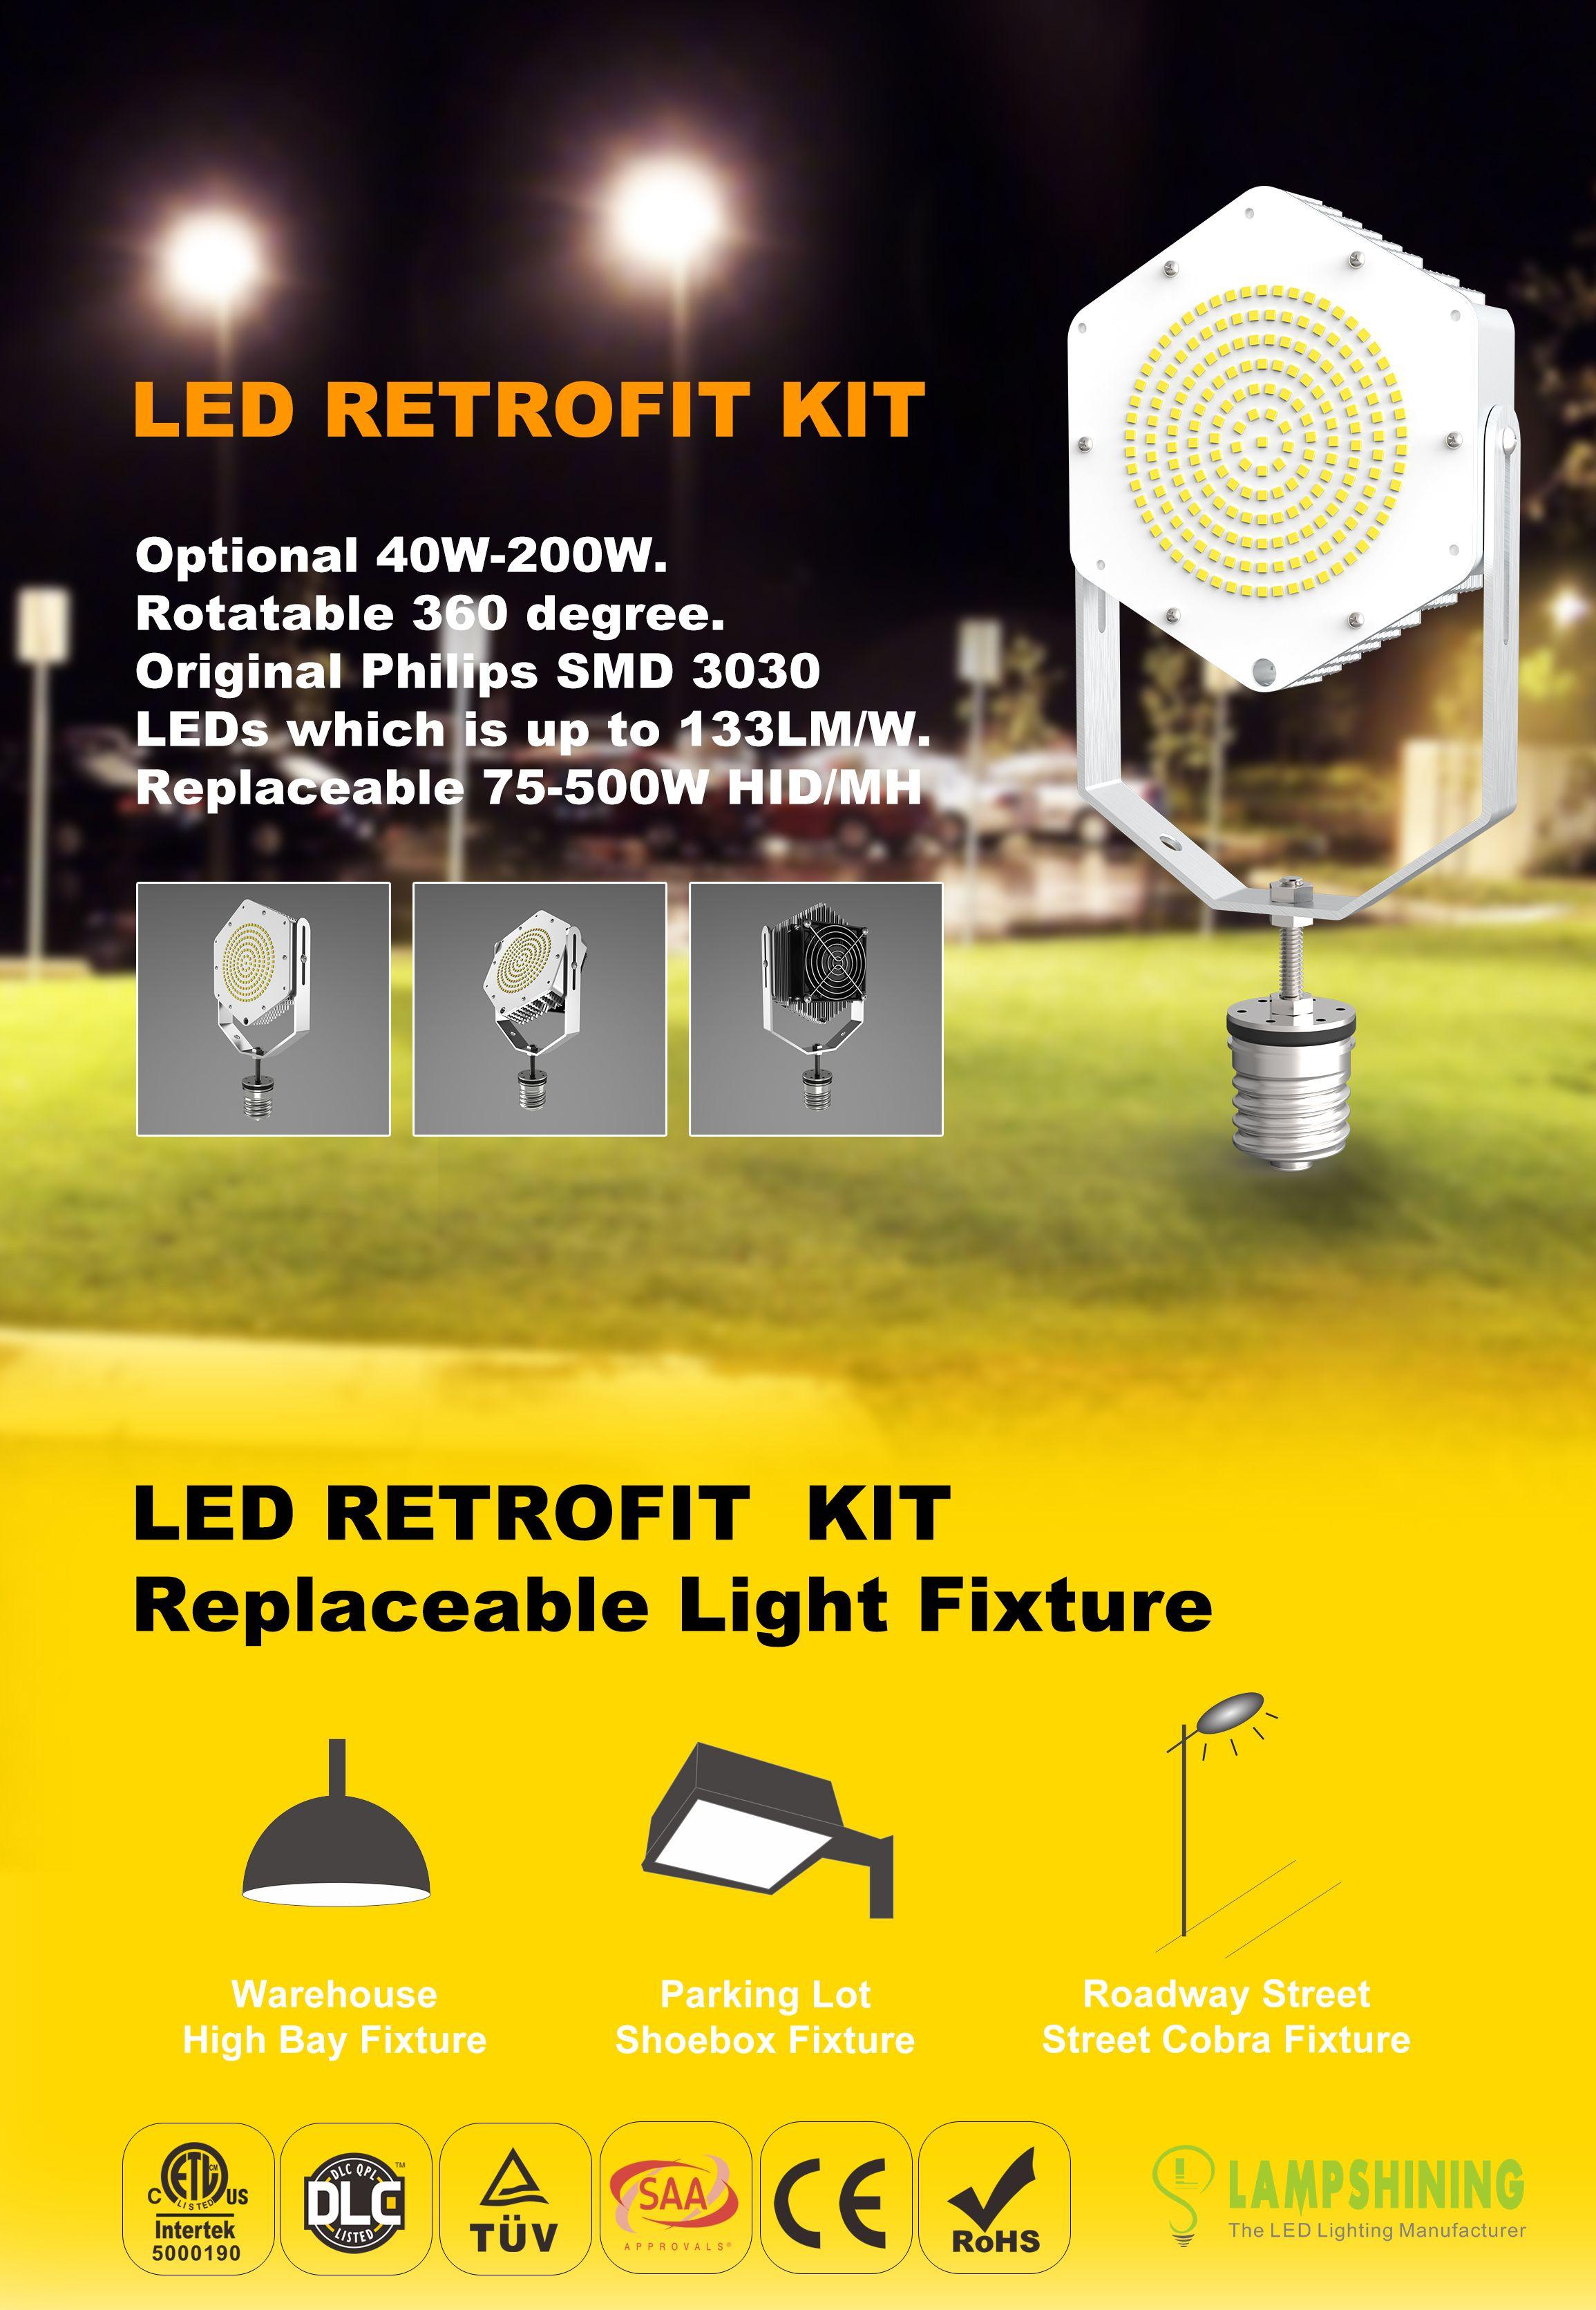 150w Led Retrofit Kits Flood Light High Bay Post Top Cobra Head Led Retrofit Led Parking Lot Lights Flood Lights 150w